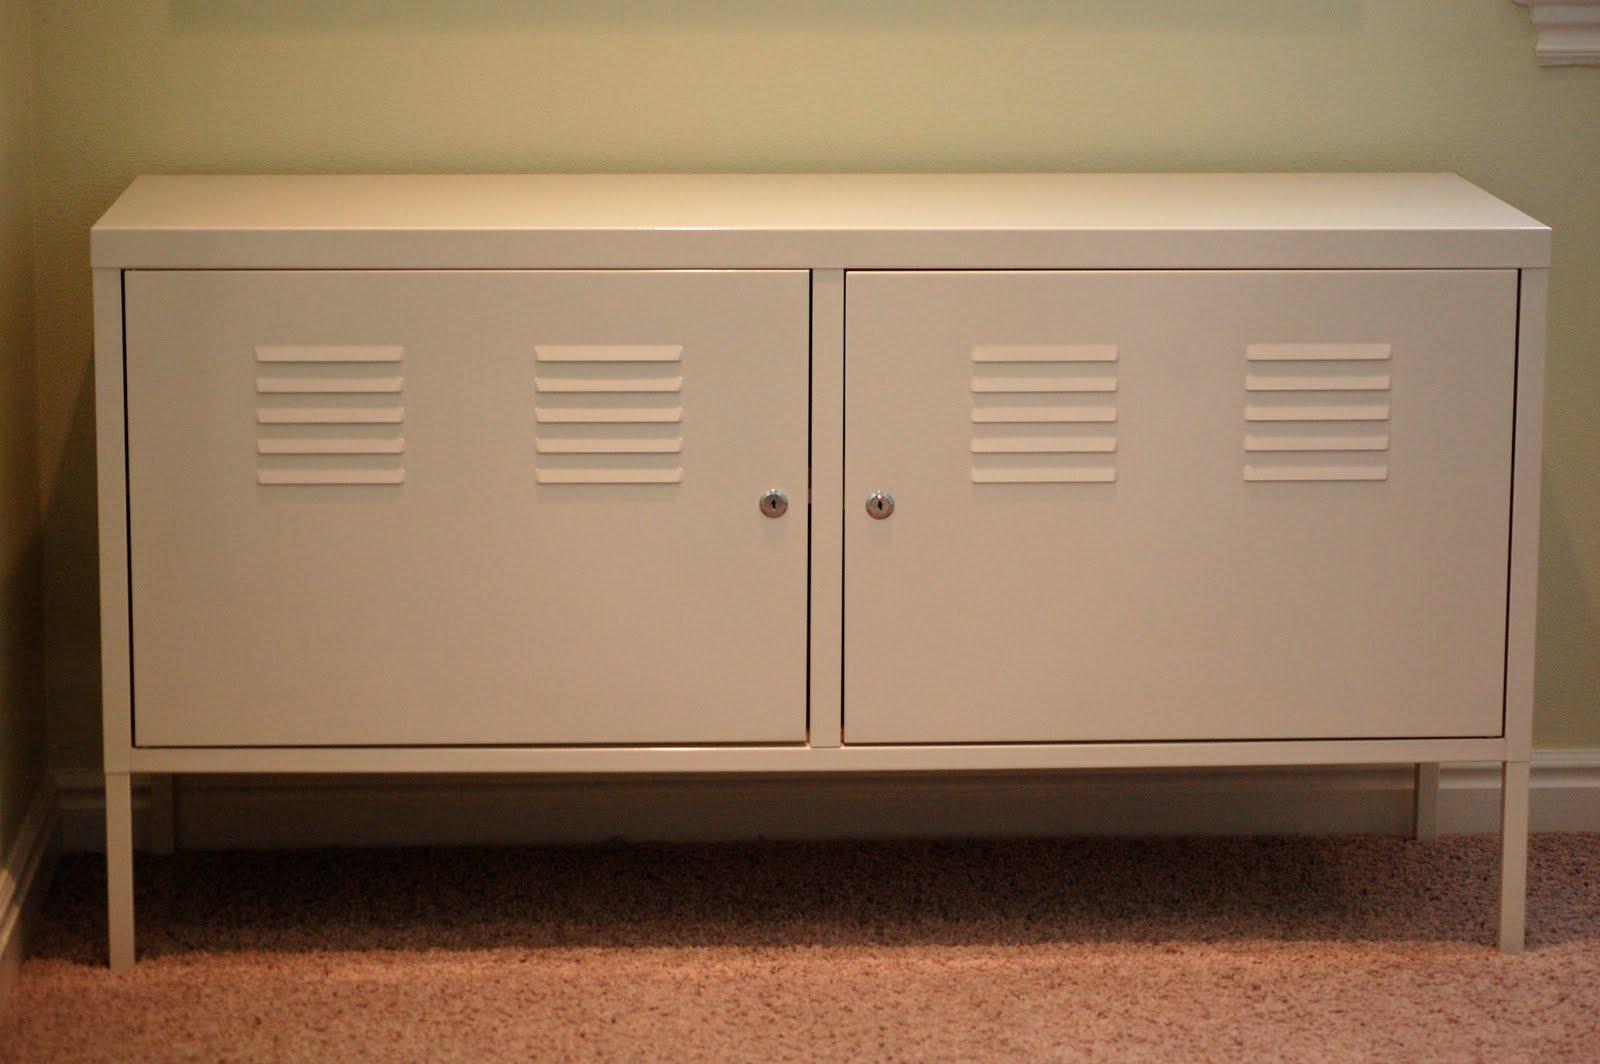 ikea office cabinet. ikea office cabinet and drawer unit ikea e